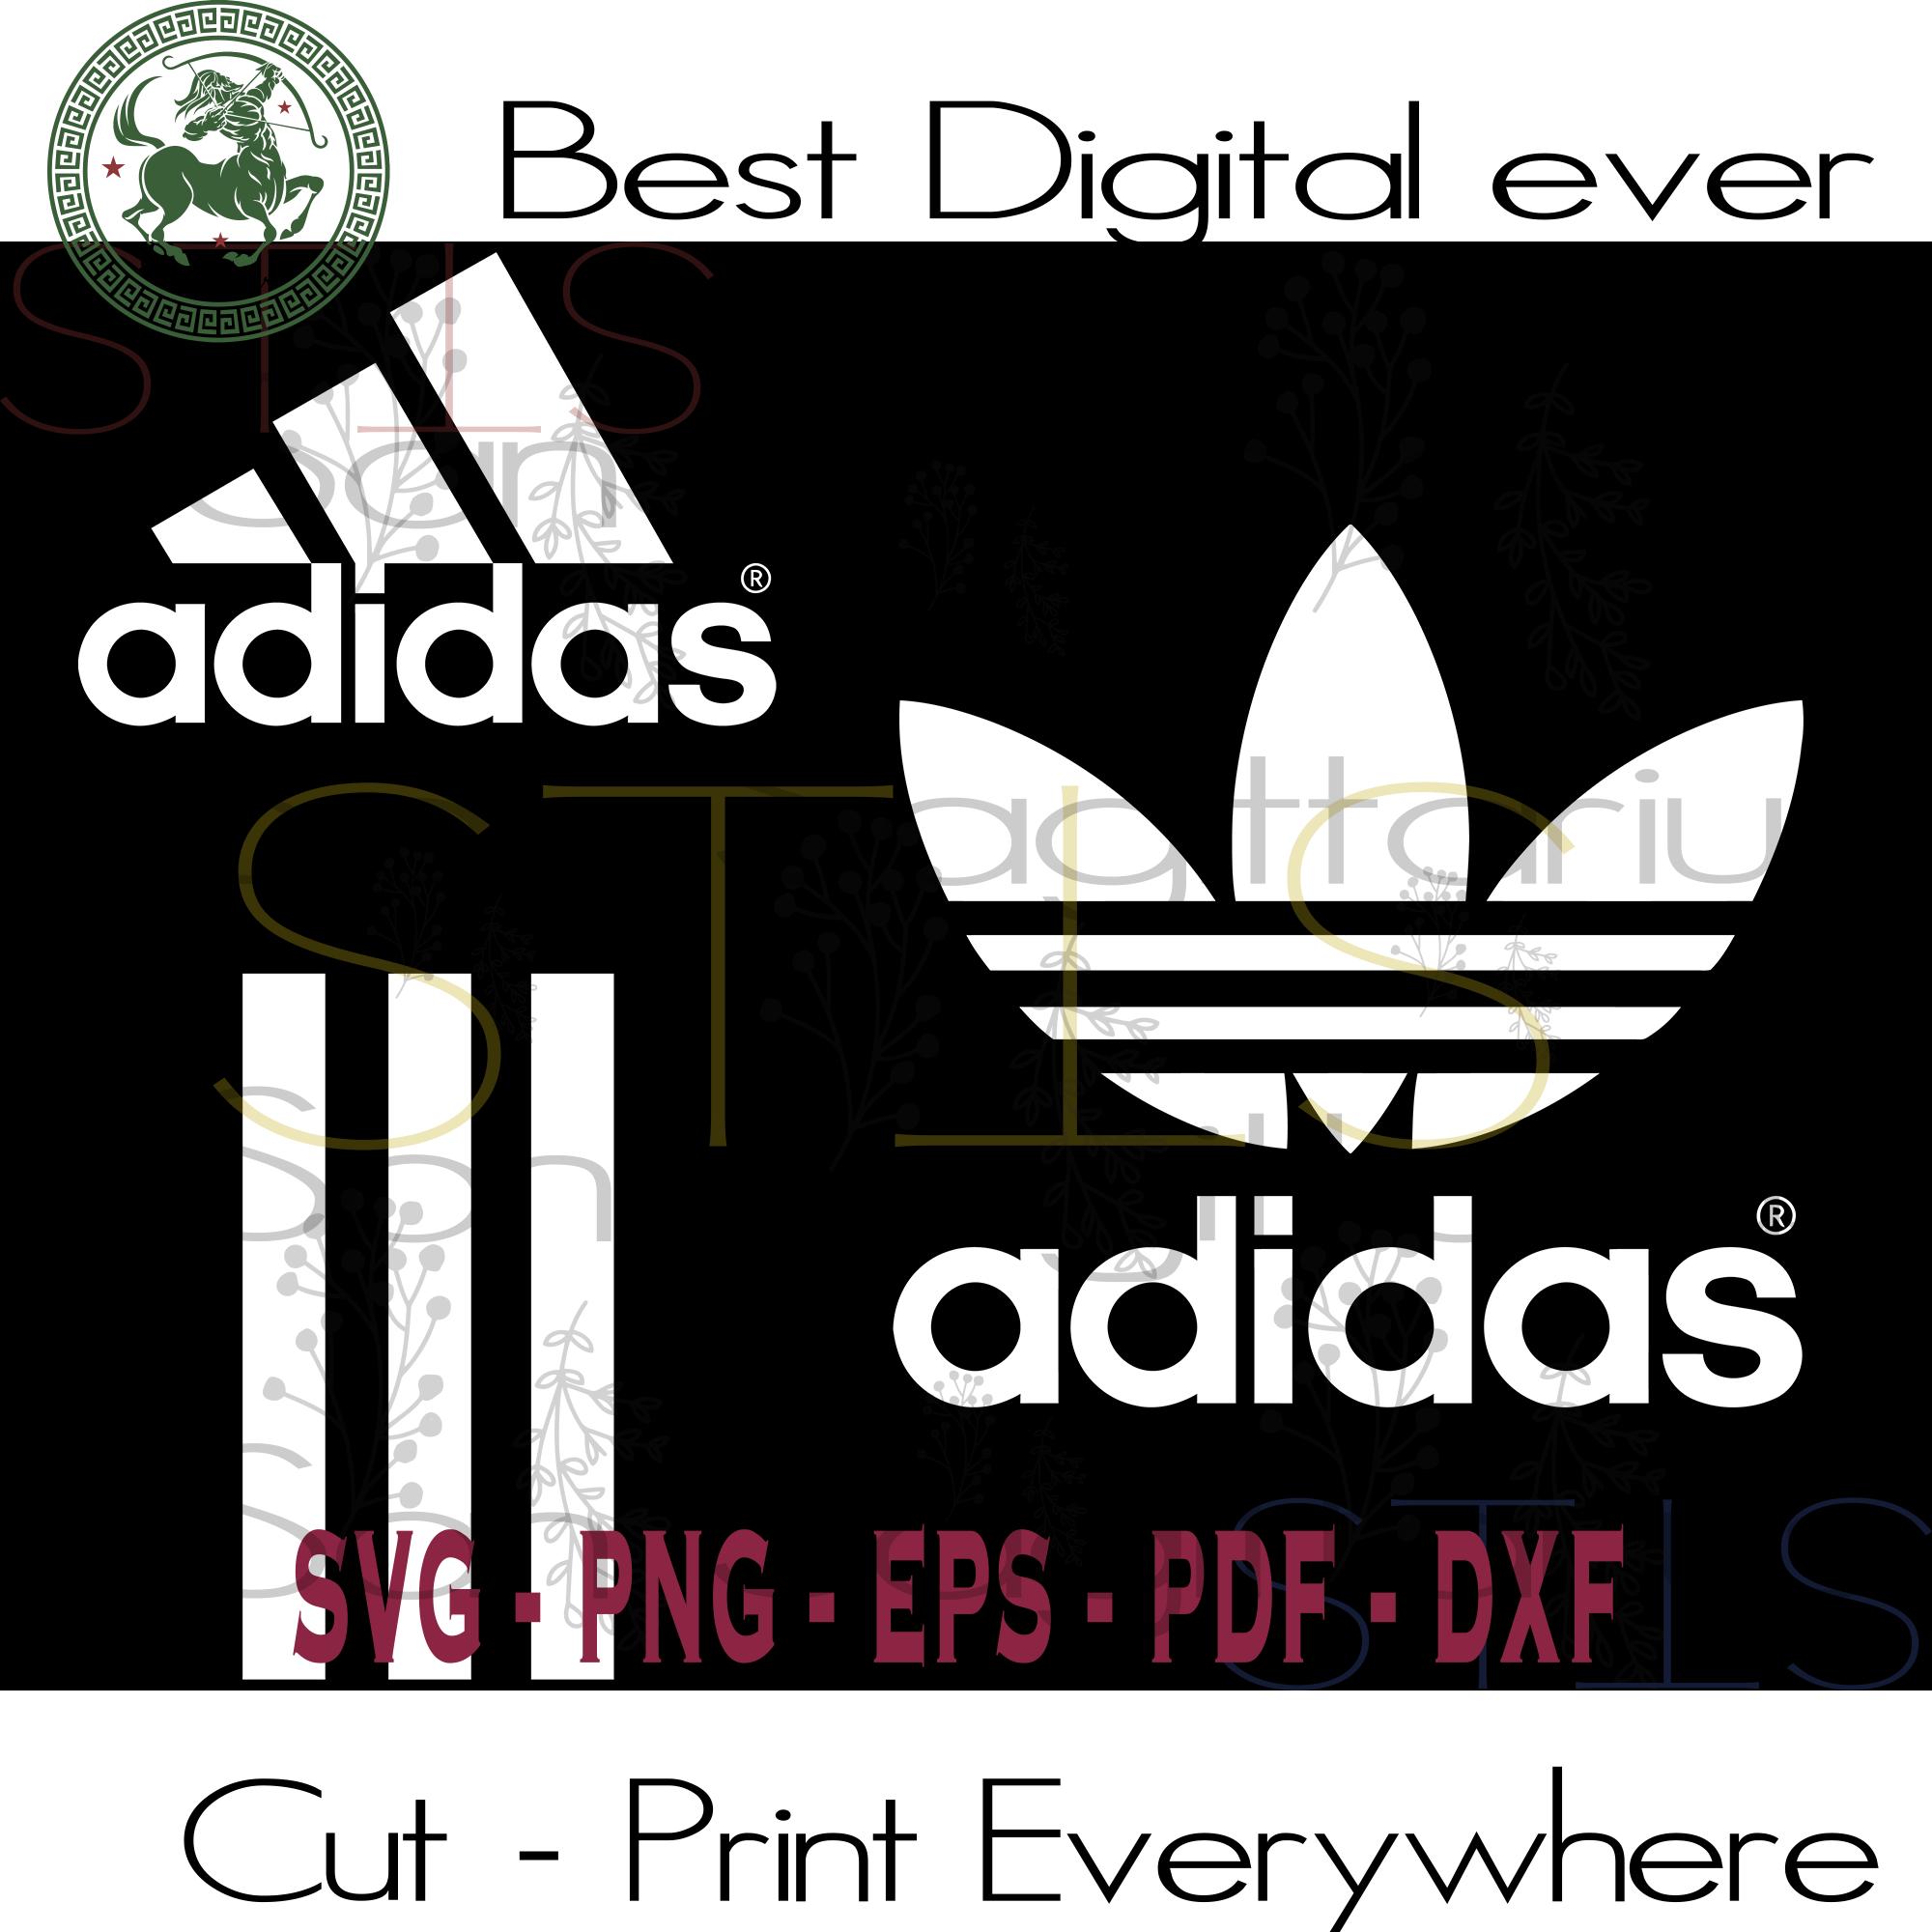 Adidas Logo, Adidas Svg, Vintage Adidas, Adidas Vintage